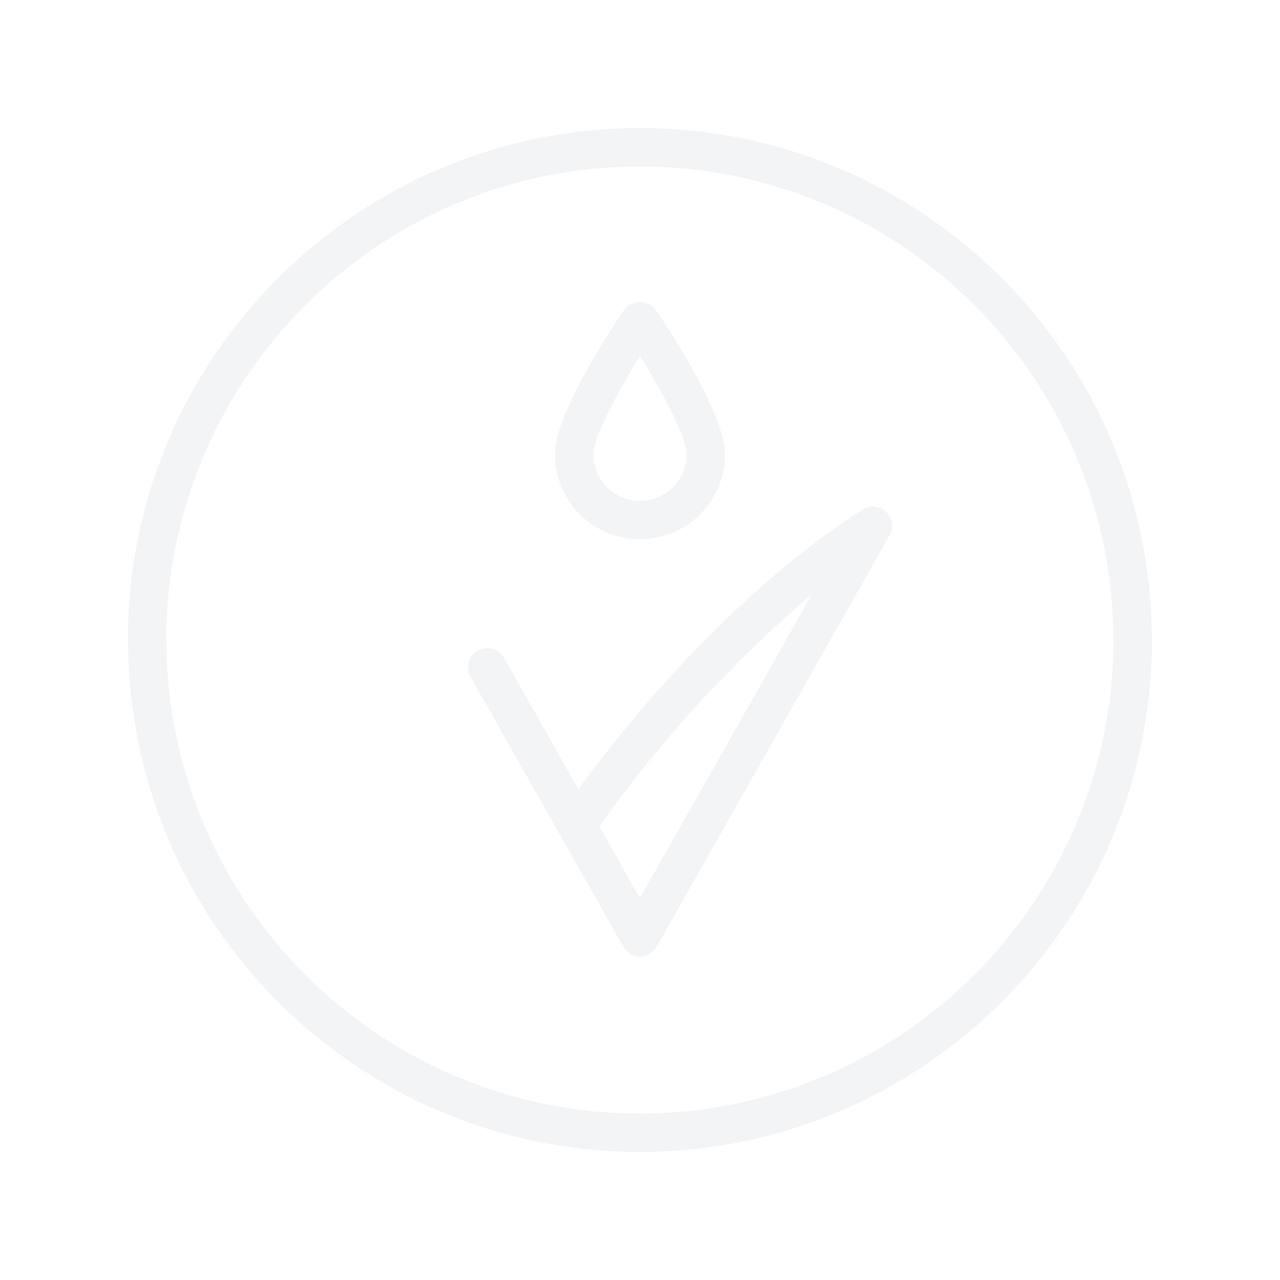 MAKEUP REVOLUTION Radiance Highlighting Palette 15g